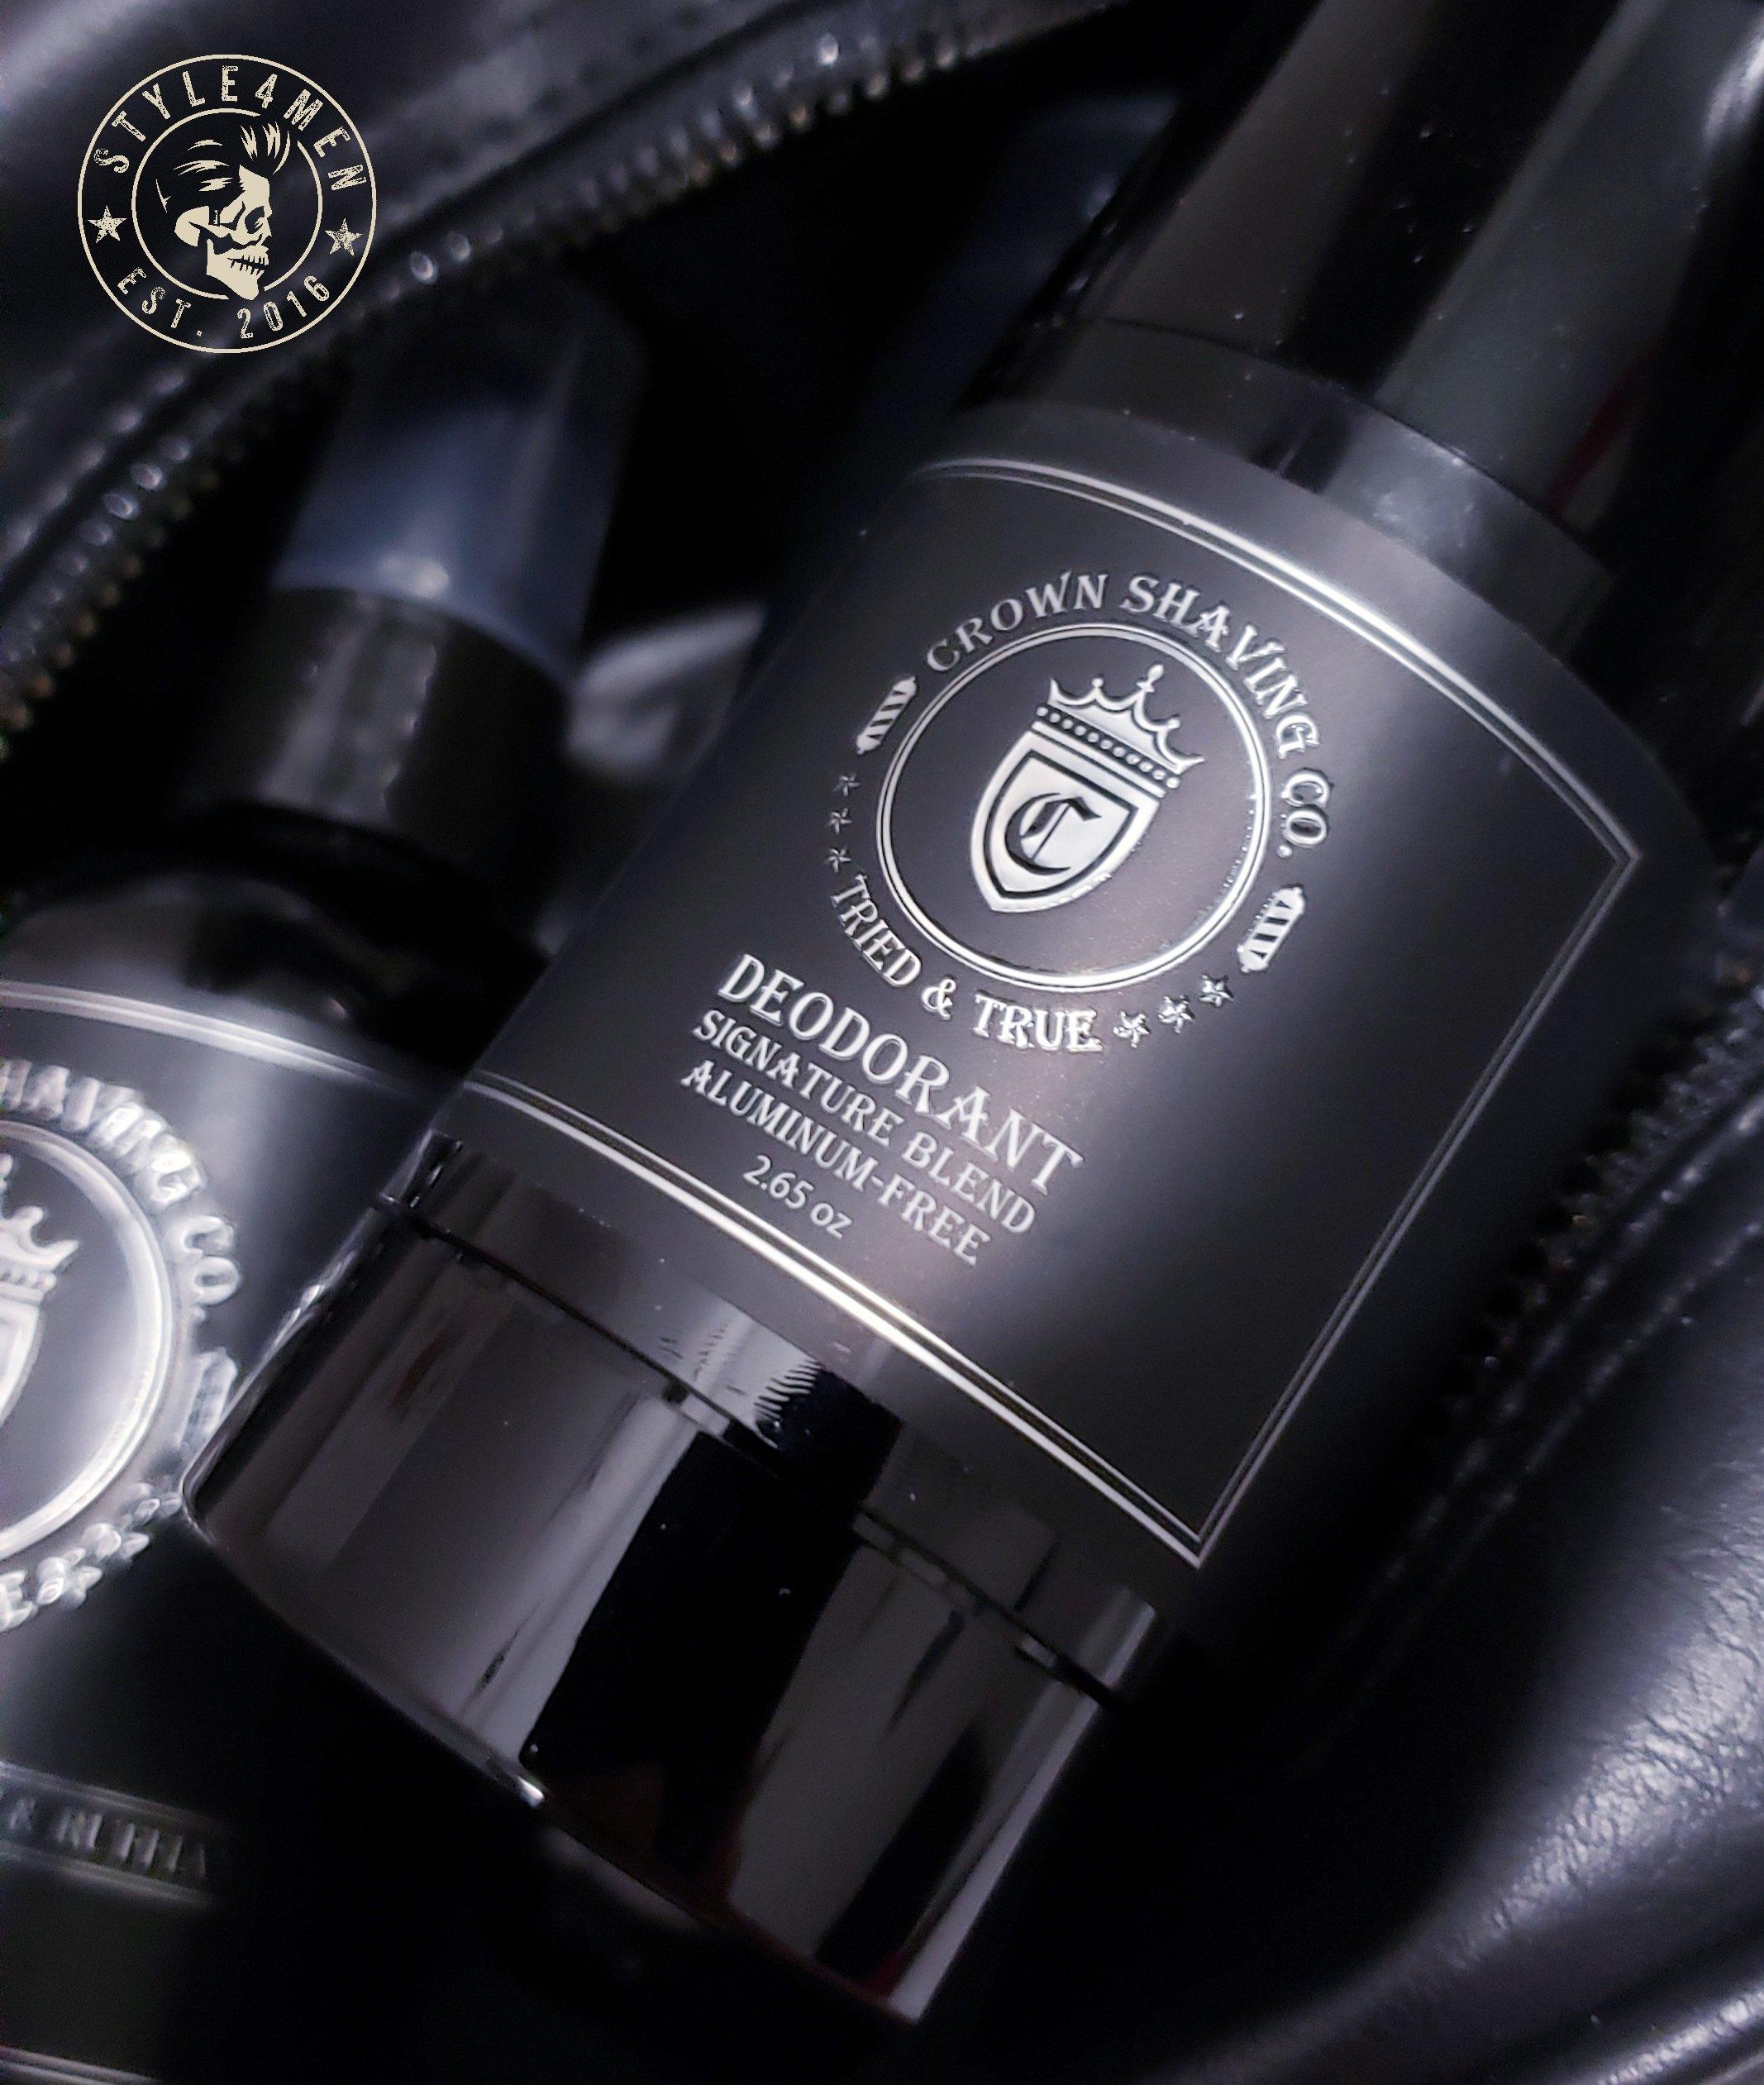 Signature Scent Deodorant by Crown Shaving